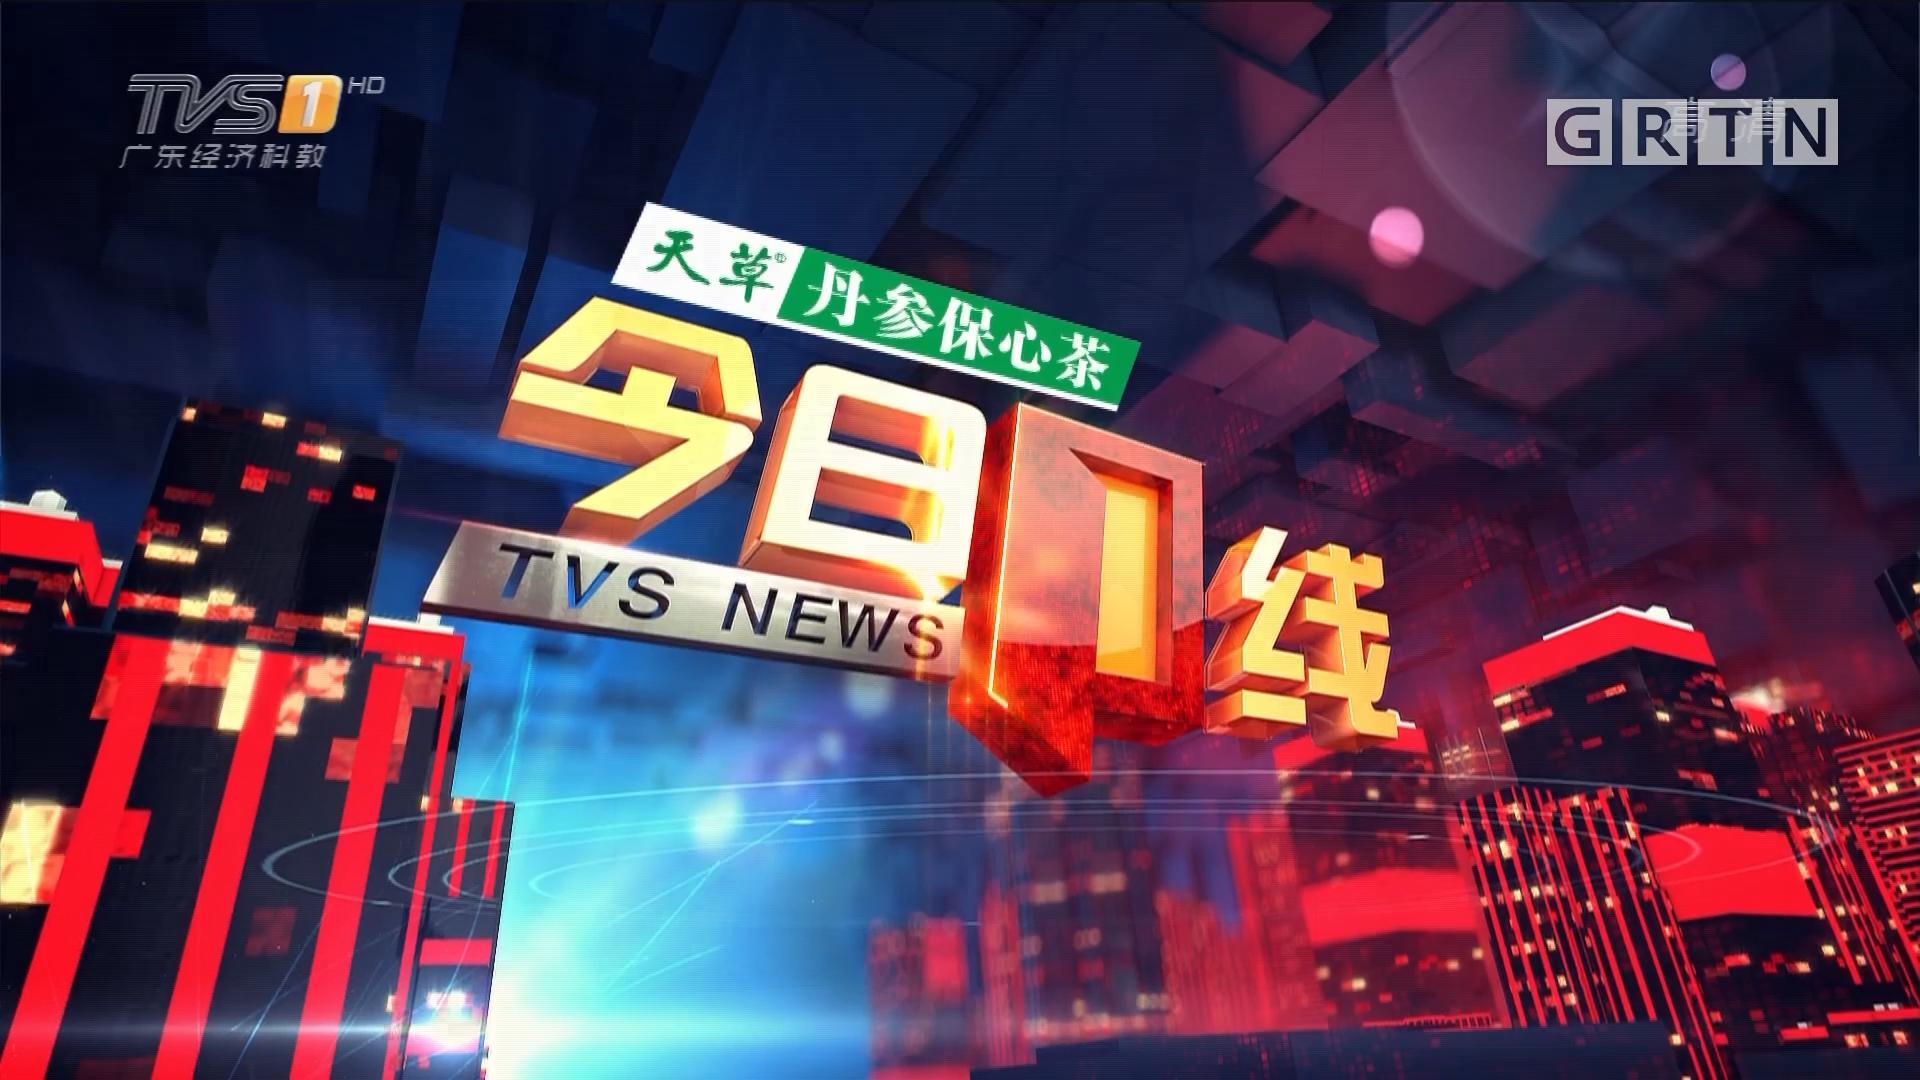 [HD][2017-10-30]今日一线:深圳:别墅施工钻穿地铁隧道 肇事者被拘